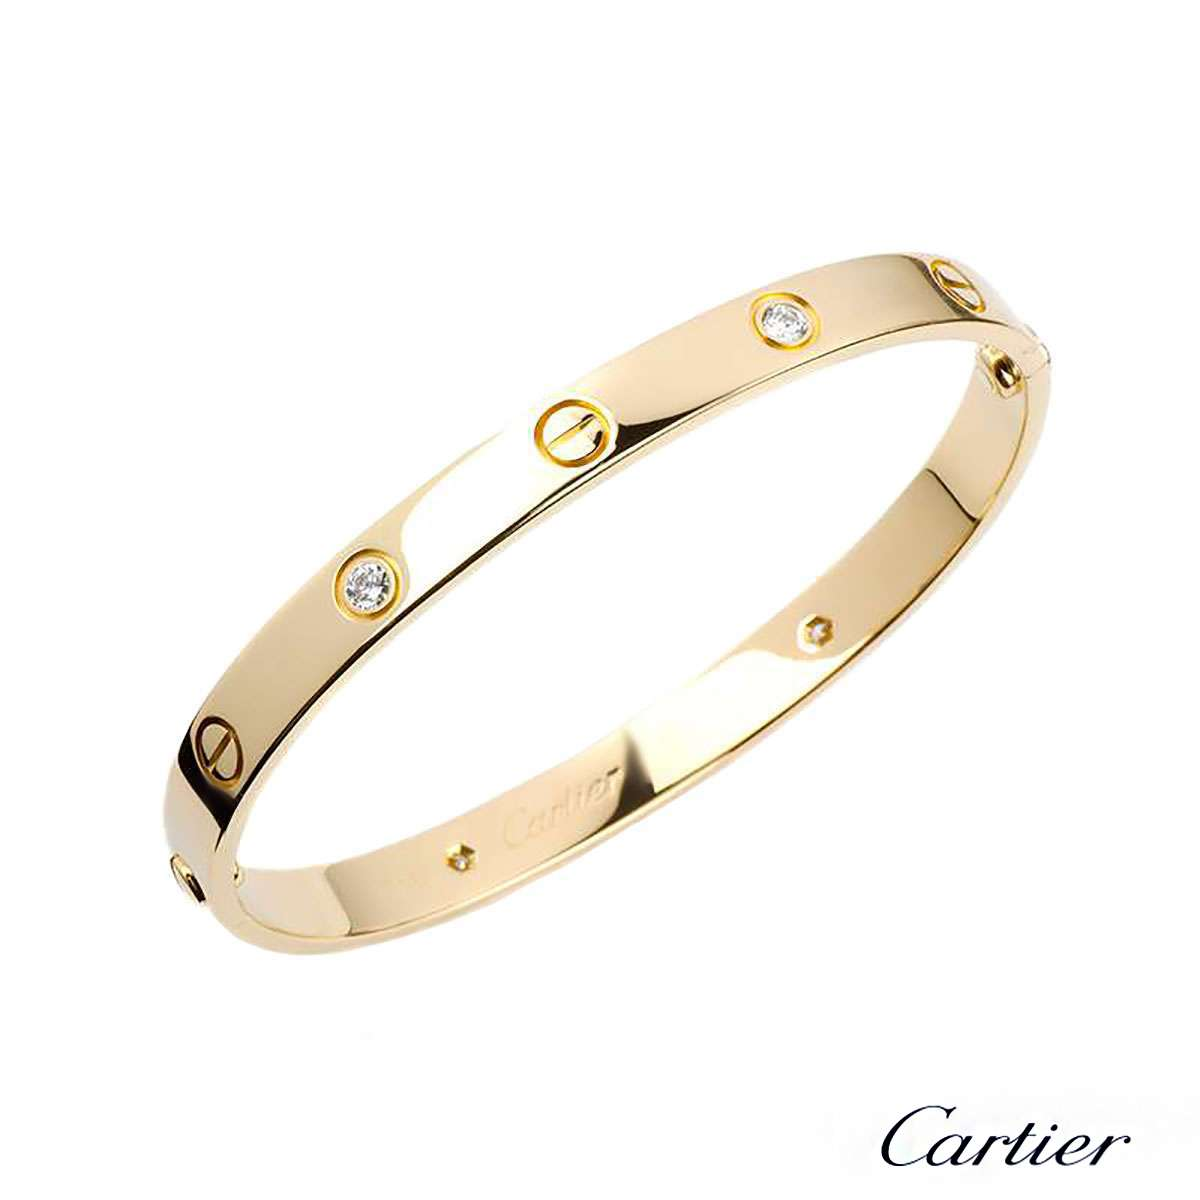 CartierYellow Gold Half Diamond Love Bracelet Size 19B6035919